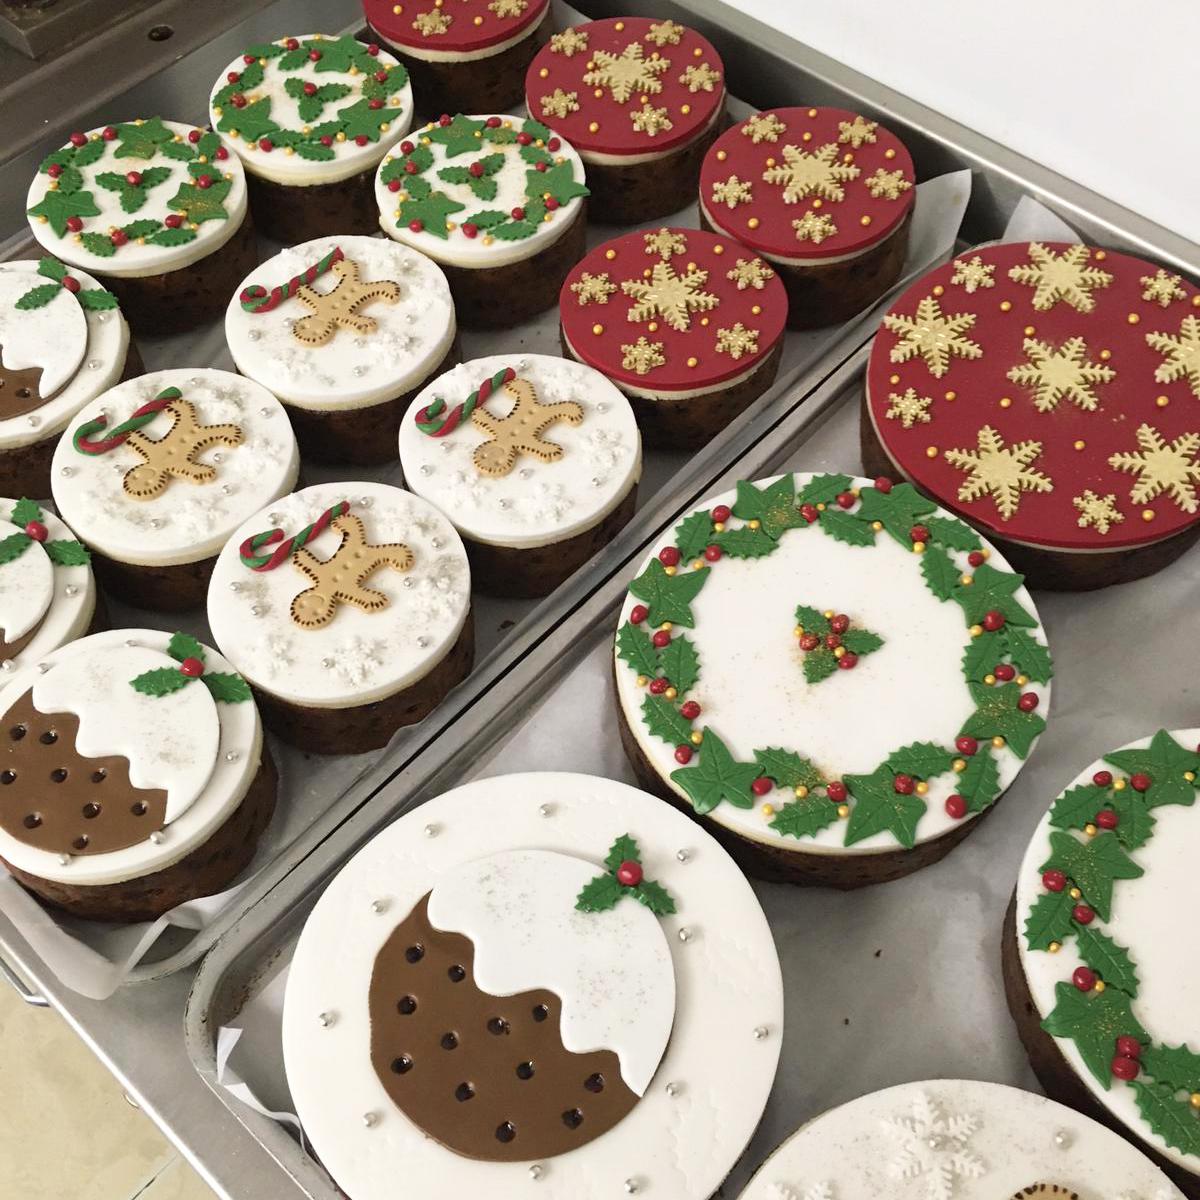 Towbury Court Fine Foods cakes 2